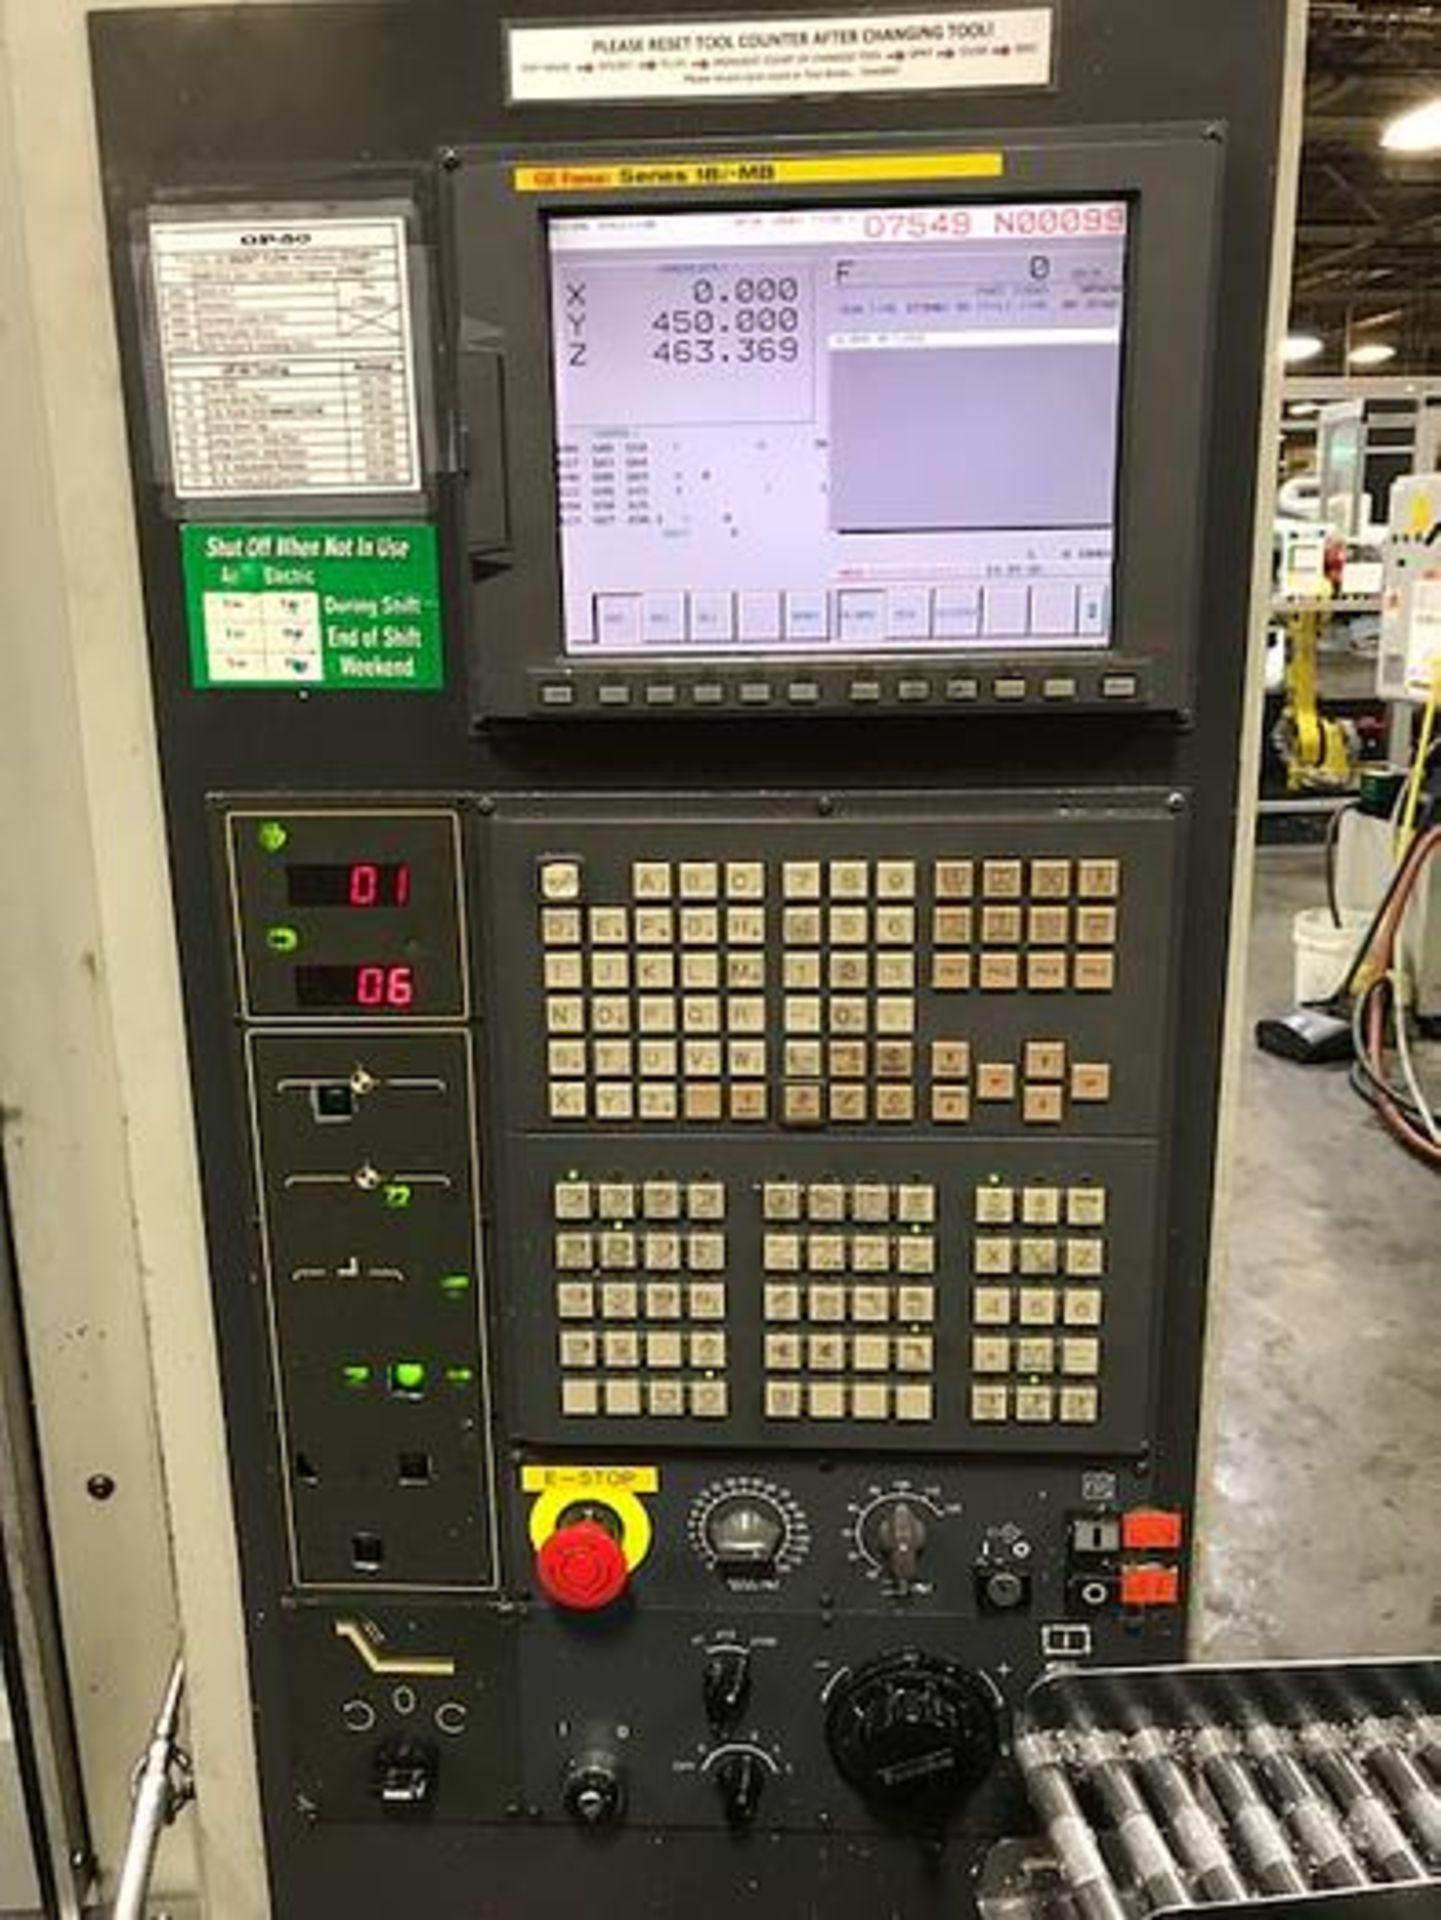 "HARDINGE XR760 CNC VMC PRODUCTION CENTER 30""X24""X24"", YEAR 2010, SN XRAB0A0001 - Image 3 of 12"